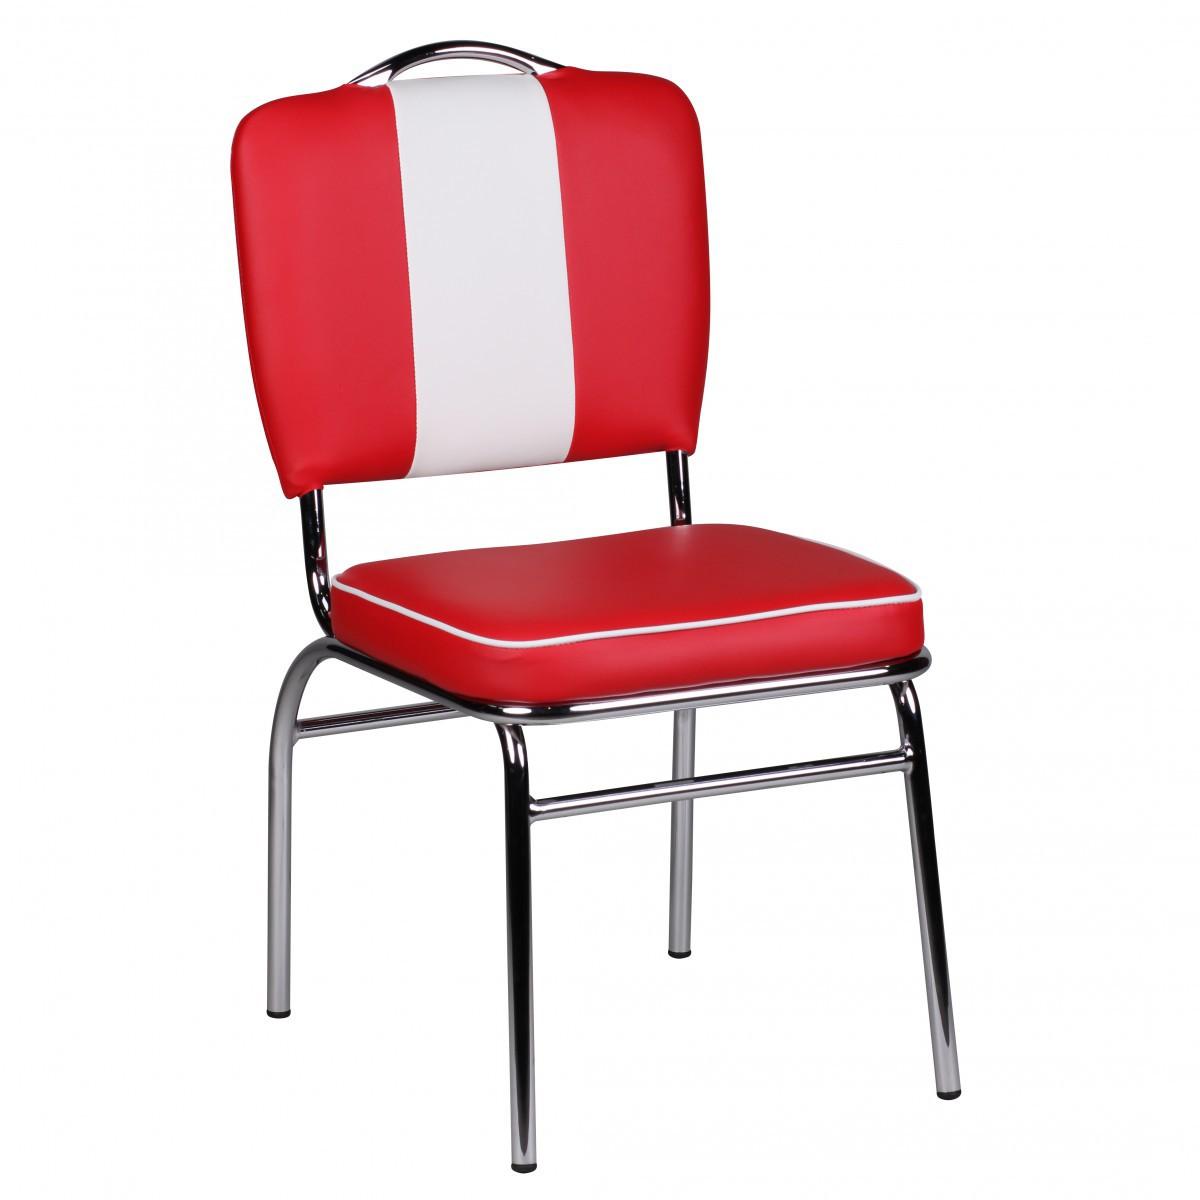 Esszimmerstuhl American Diner Stuhl 50er Jahre Retro Möbel Stuhl